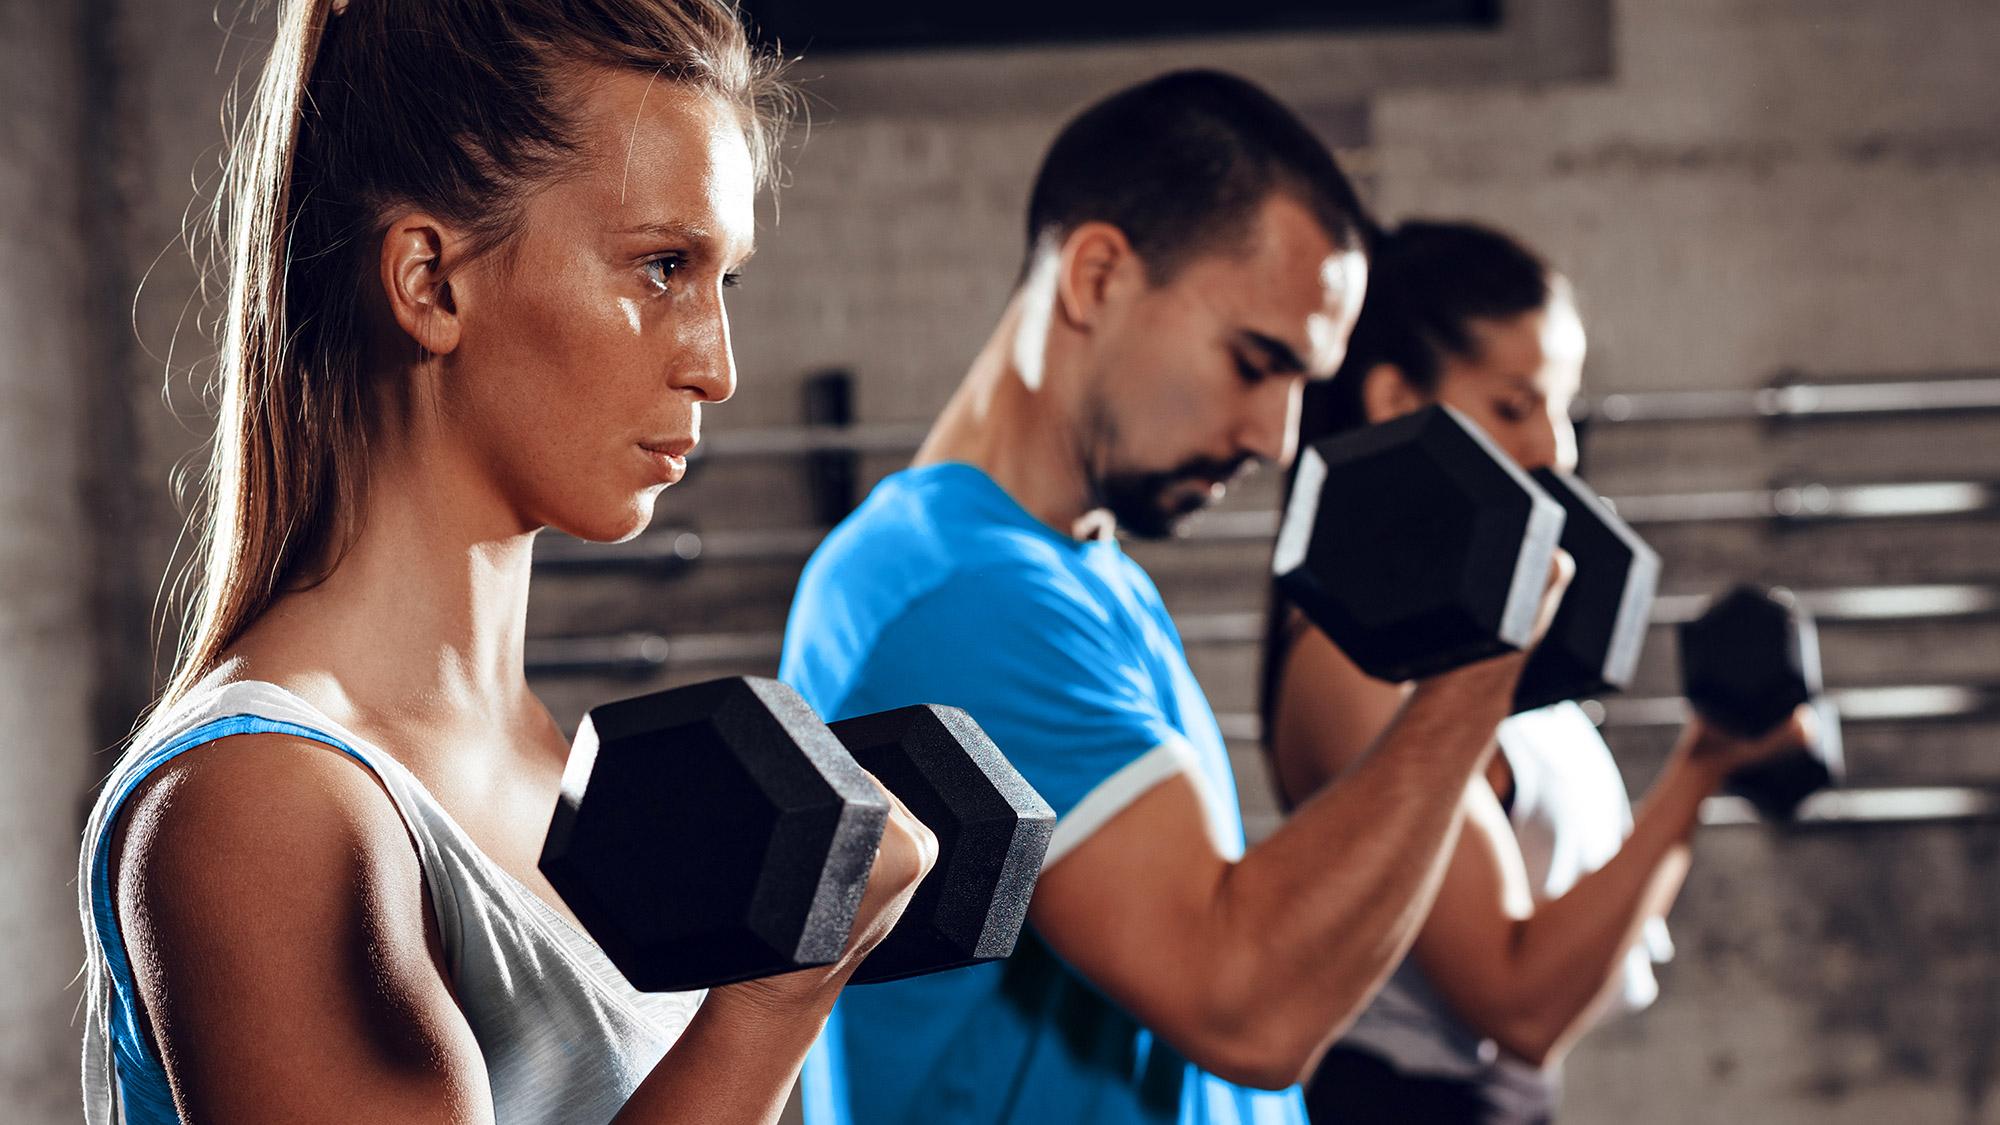 Best home gym equipment: CAP Barbell Coated Hex Dumbbells